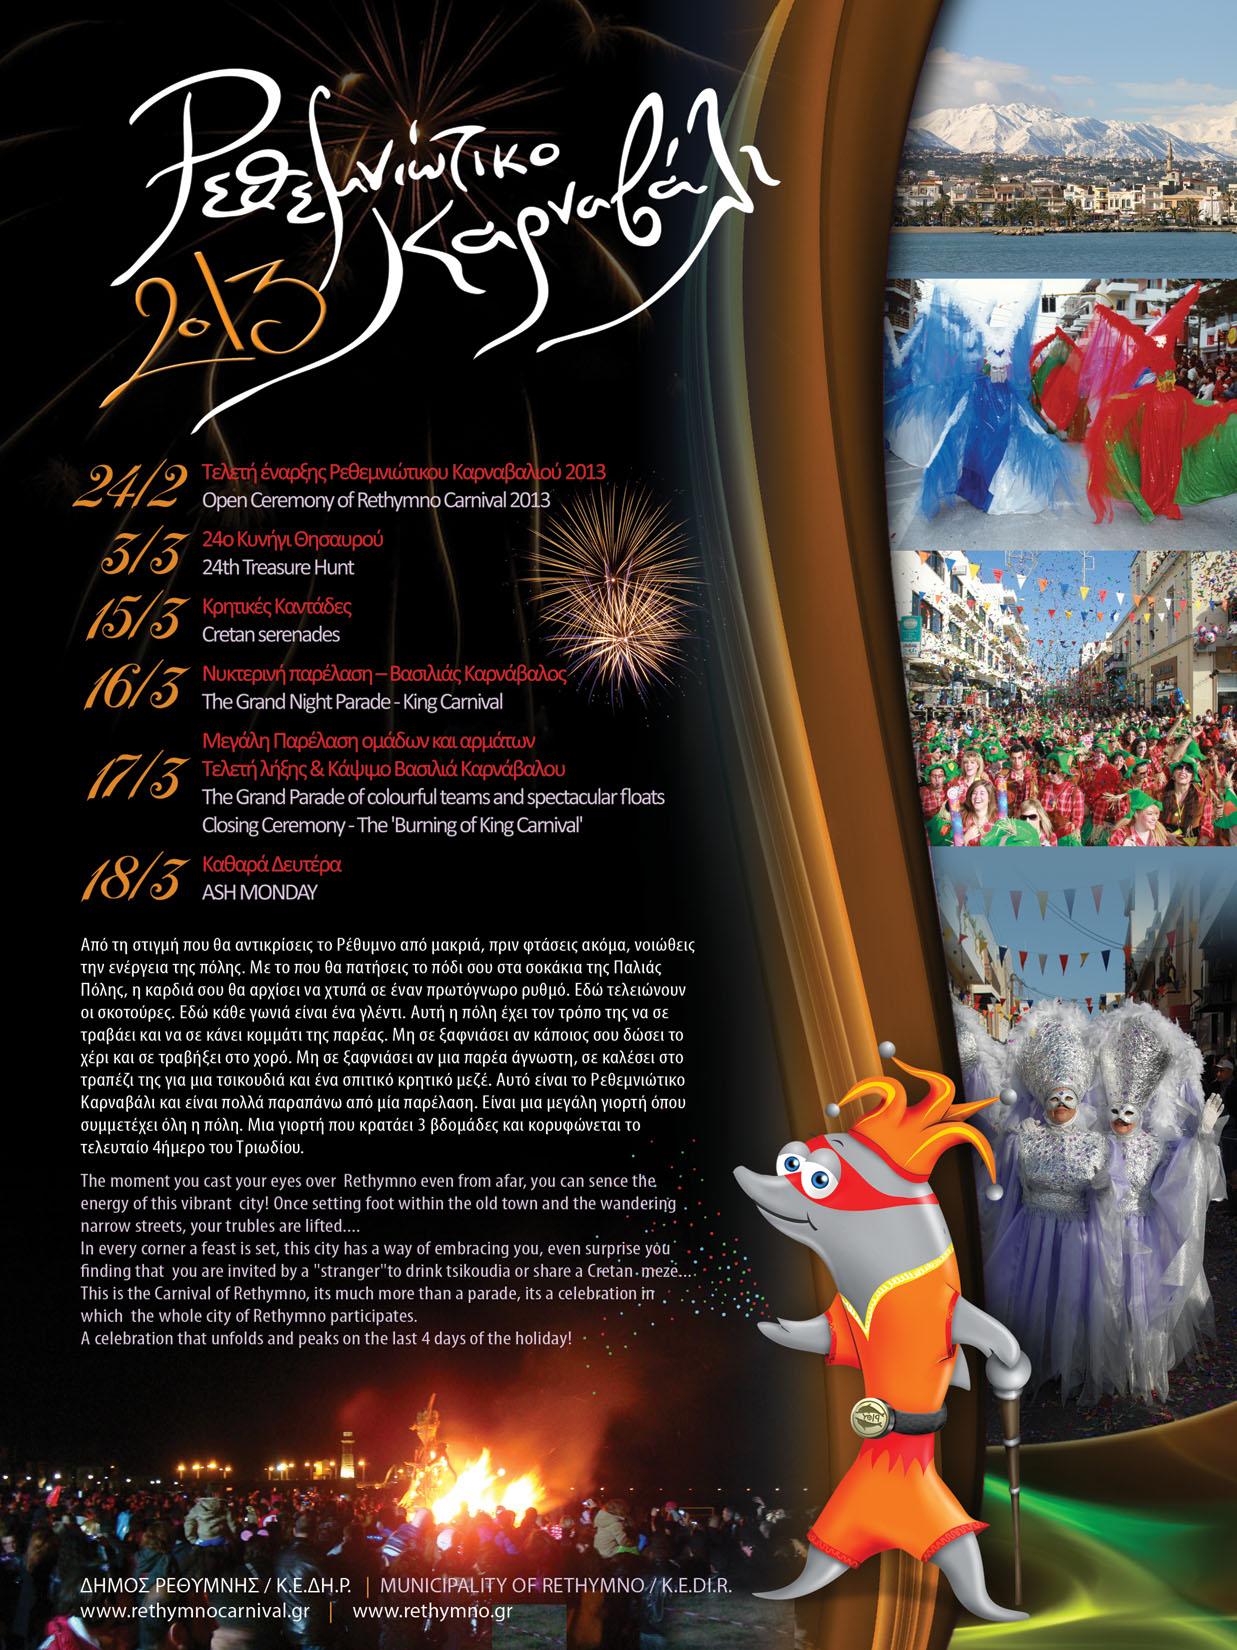 Carnival of Rethymno 2013